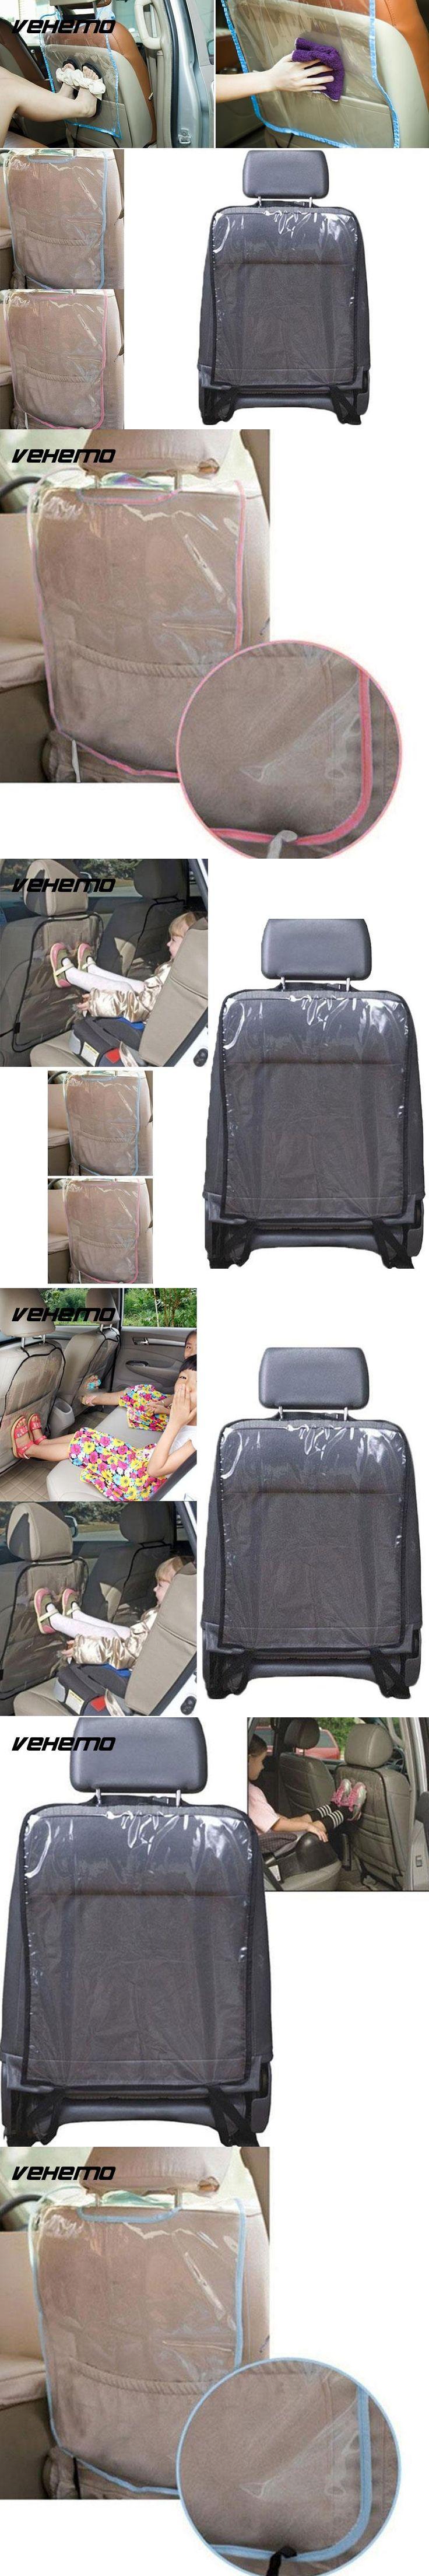 Vehemo Car Back Seat Protector Cover Children Anti Kick Mat Protector Pad Cushion Infant Car Seats Covers Storage Bag Organizer